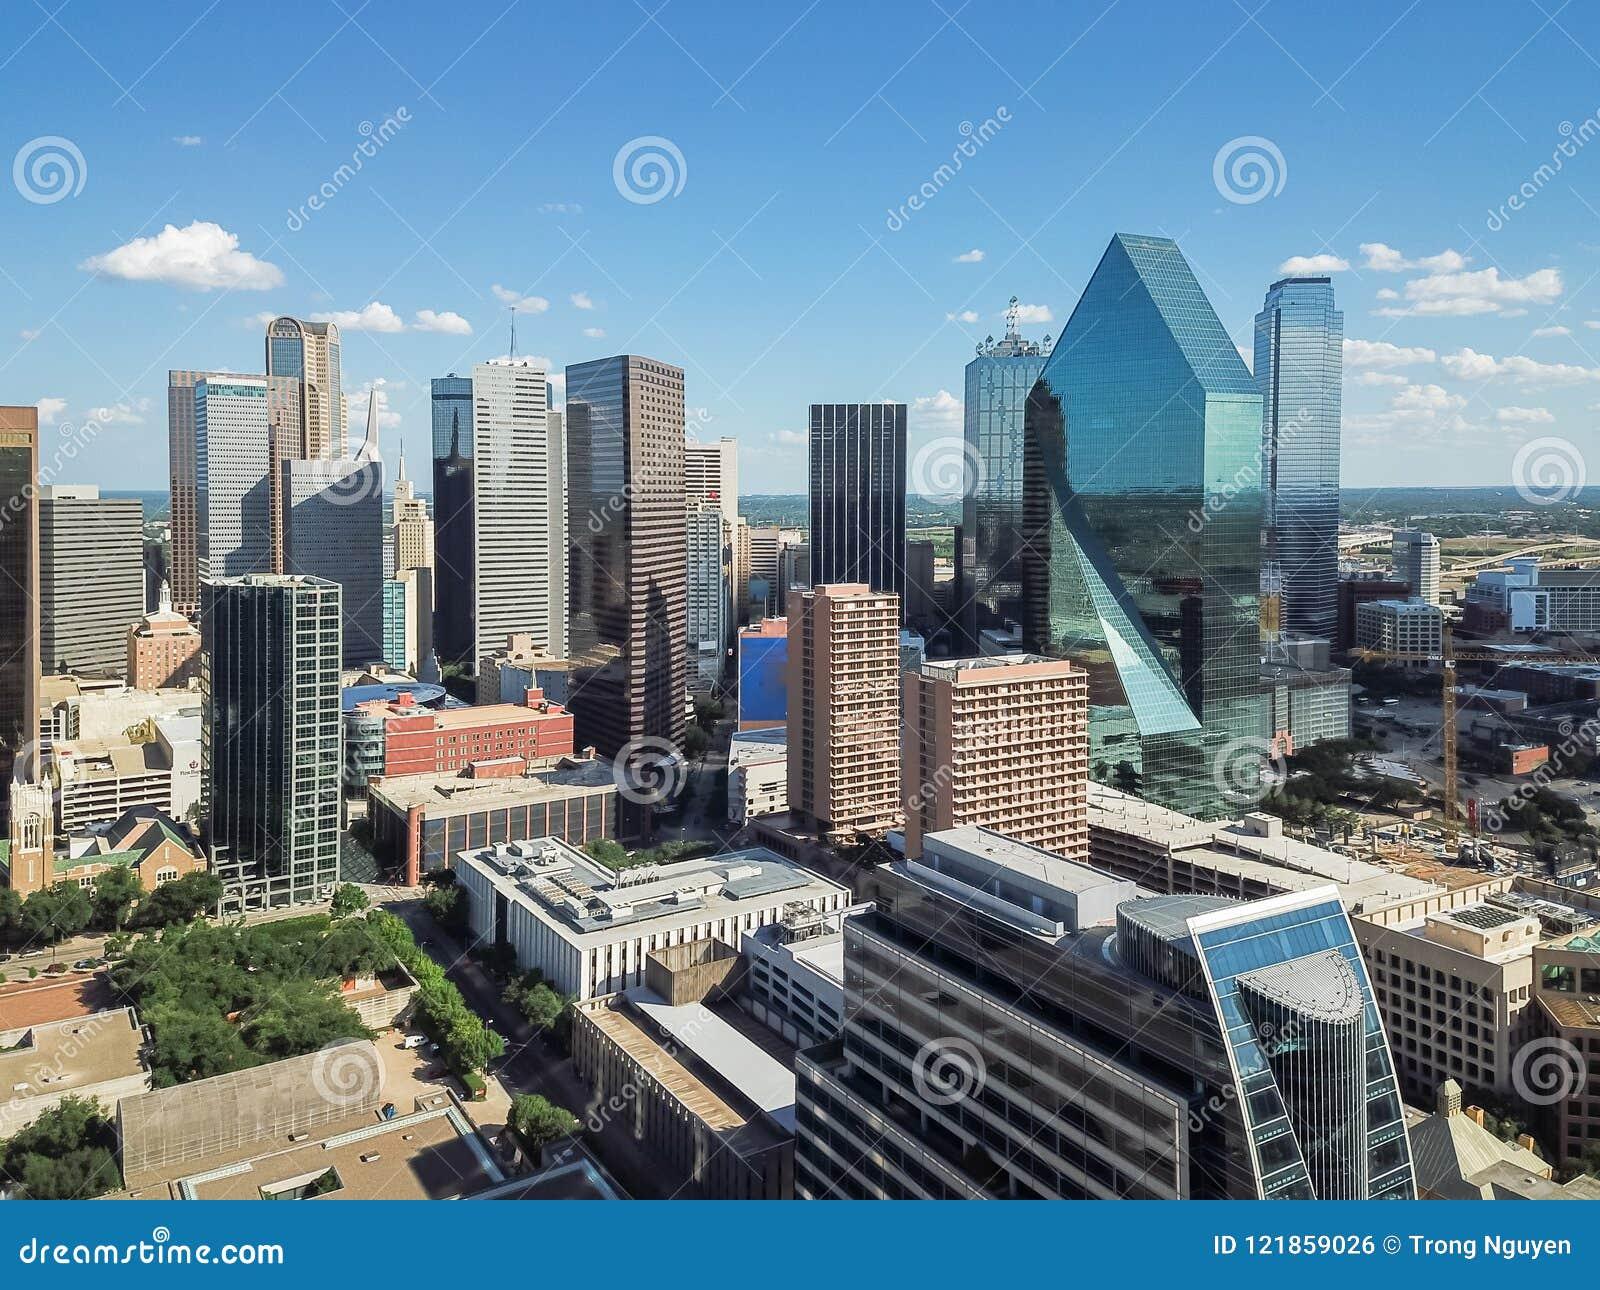 Blue Skies Of Texas >> Aerial View Downtown Dallas Skyscrapers Under Cloud Blue Sky